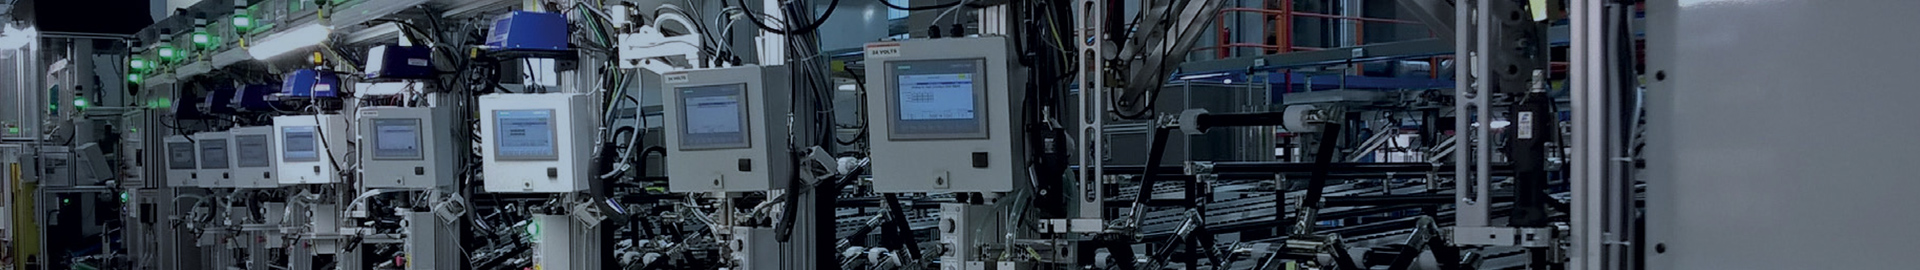 portfolio-banner-image avvitatori elettrici industriali